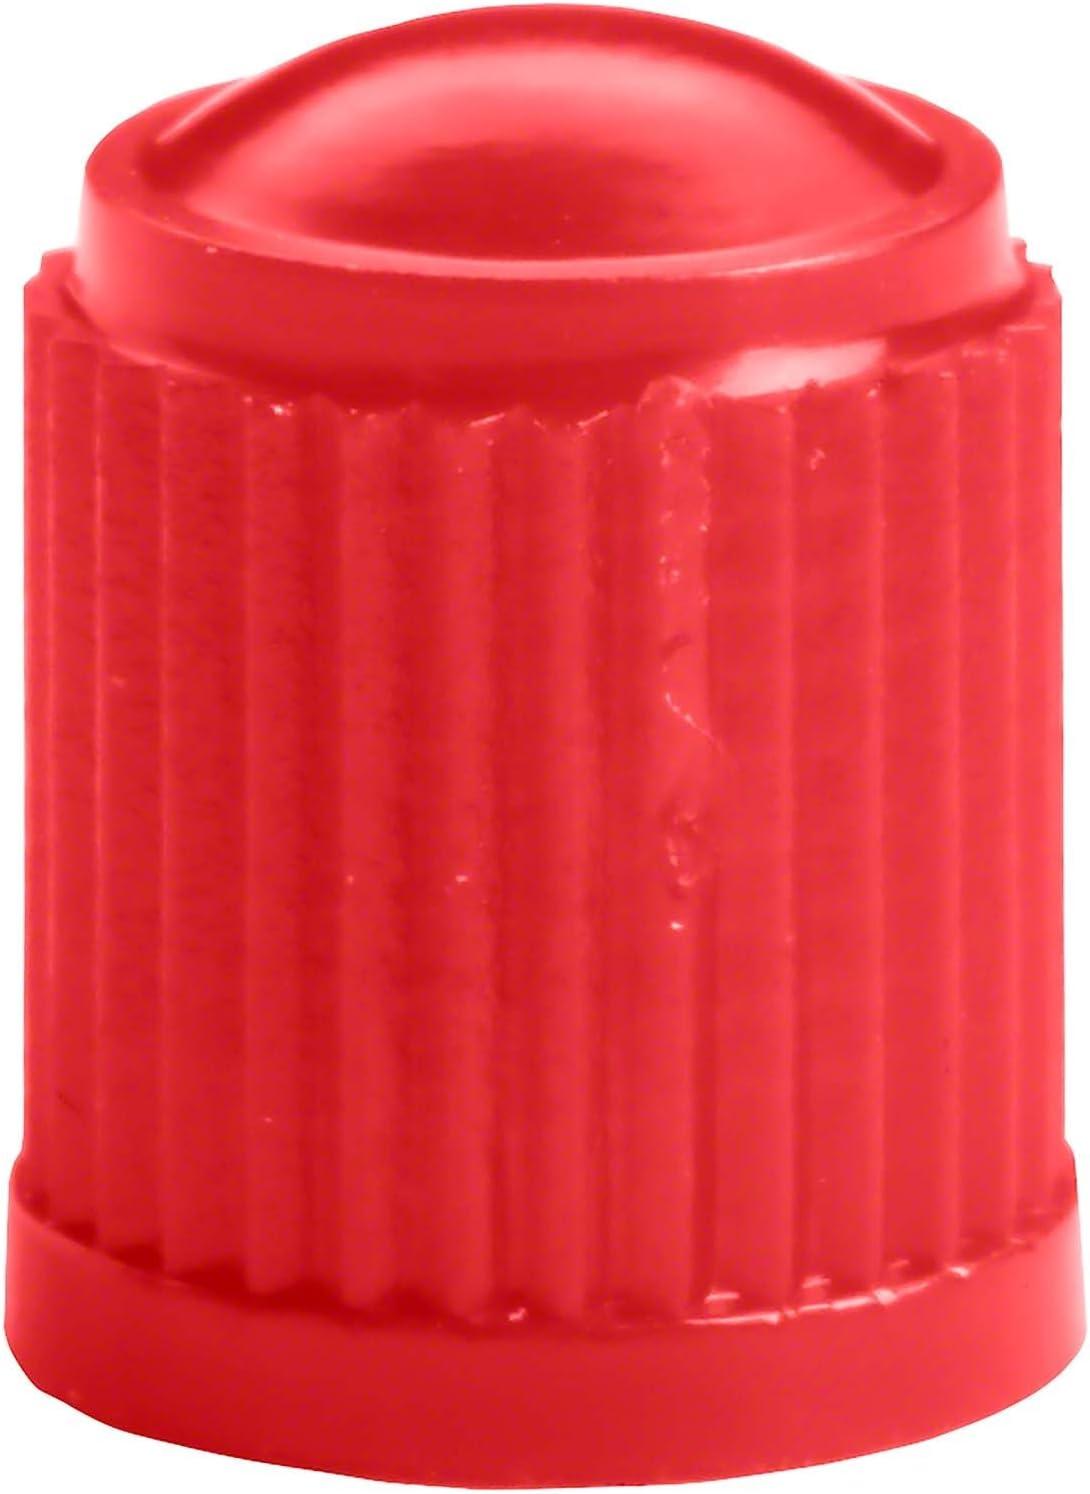 100x Tappi valvole pneumatici rosso con sigillo Hofmann Power Weight Tappi antipolvere pneumatici cappucci valvole